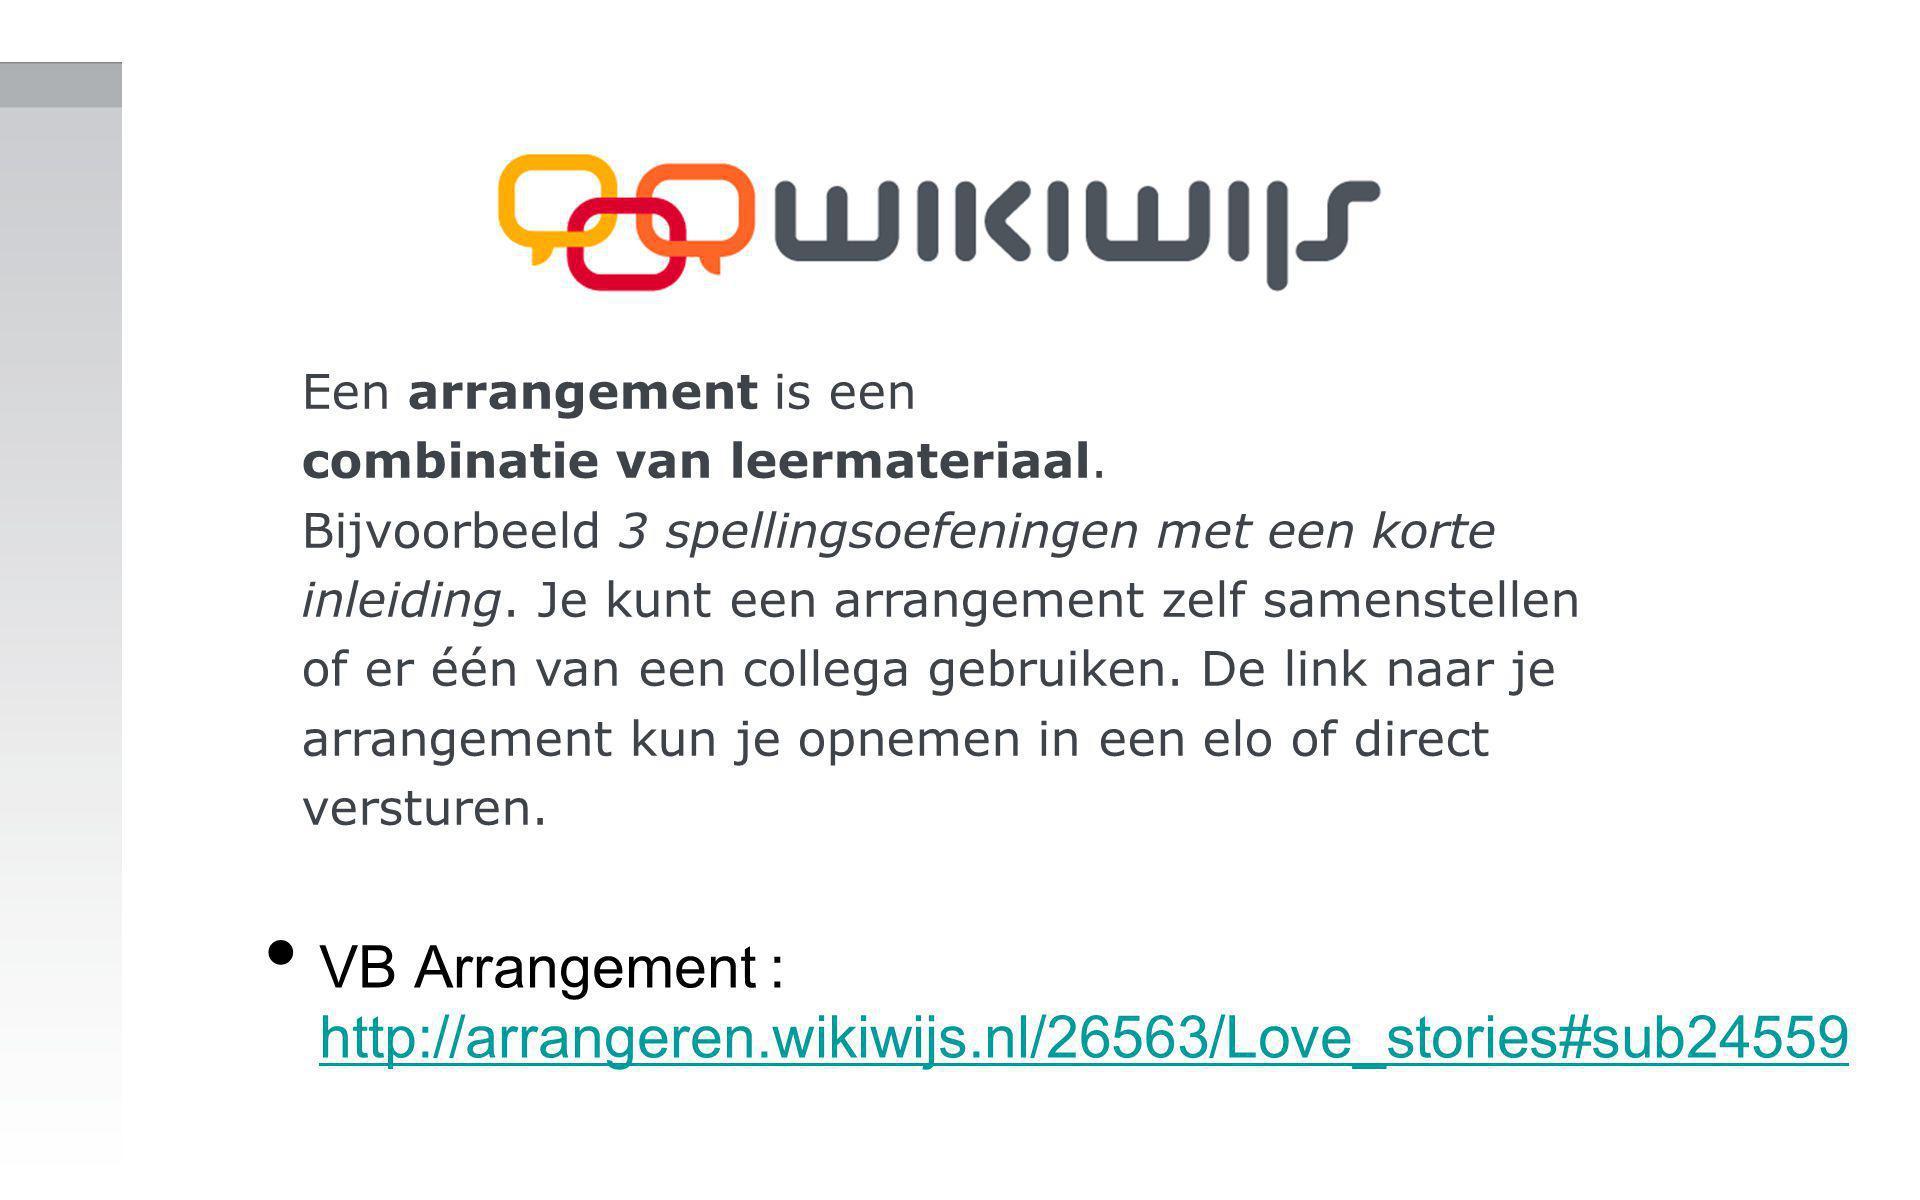 VB Arrangement : http://arrangeren.wikiwijs.nl/26563/Love_stories#sub24559 http://arrangeren.wikiwijs.nl/26563/Love_stories#sub24559 Een arrangement is een combinatie van leermateriaal.